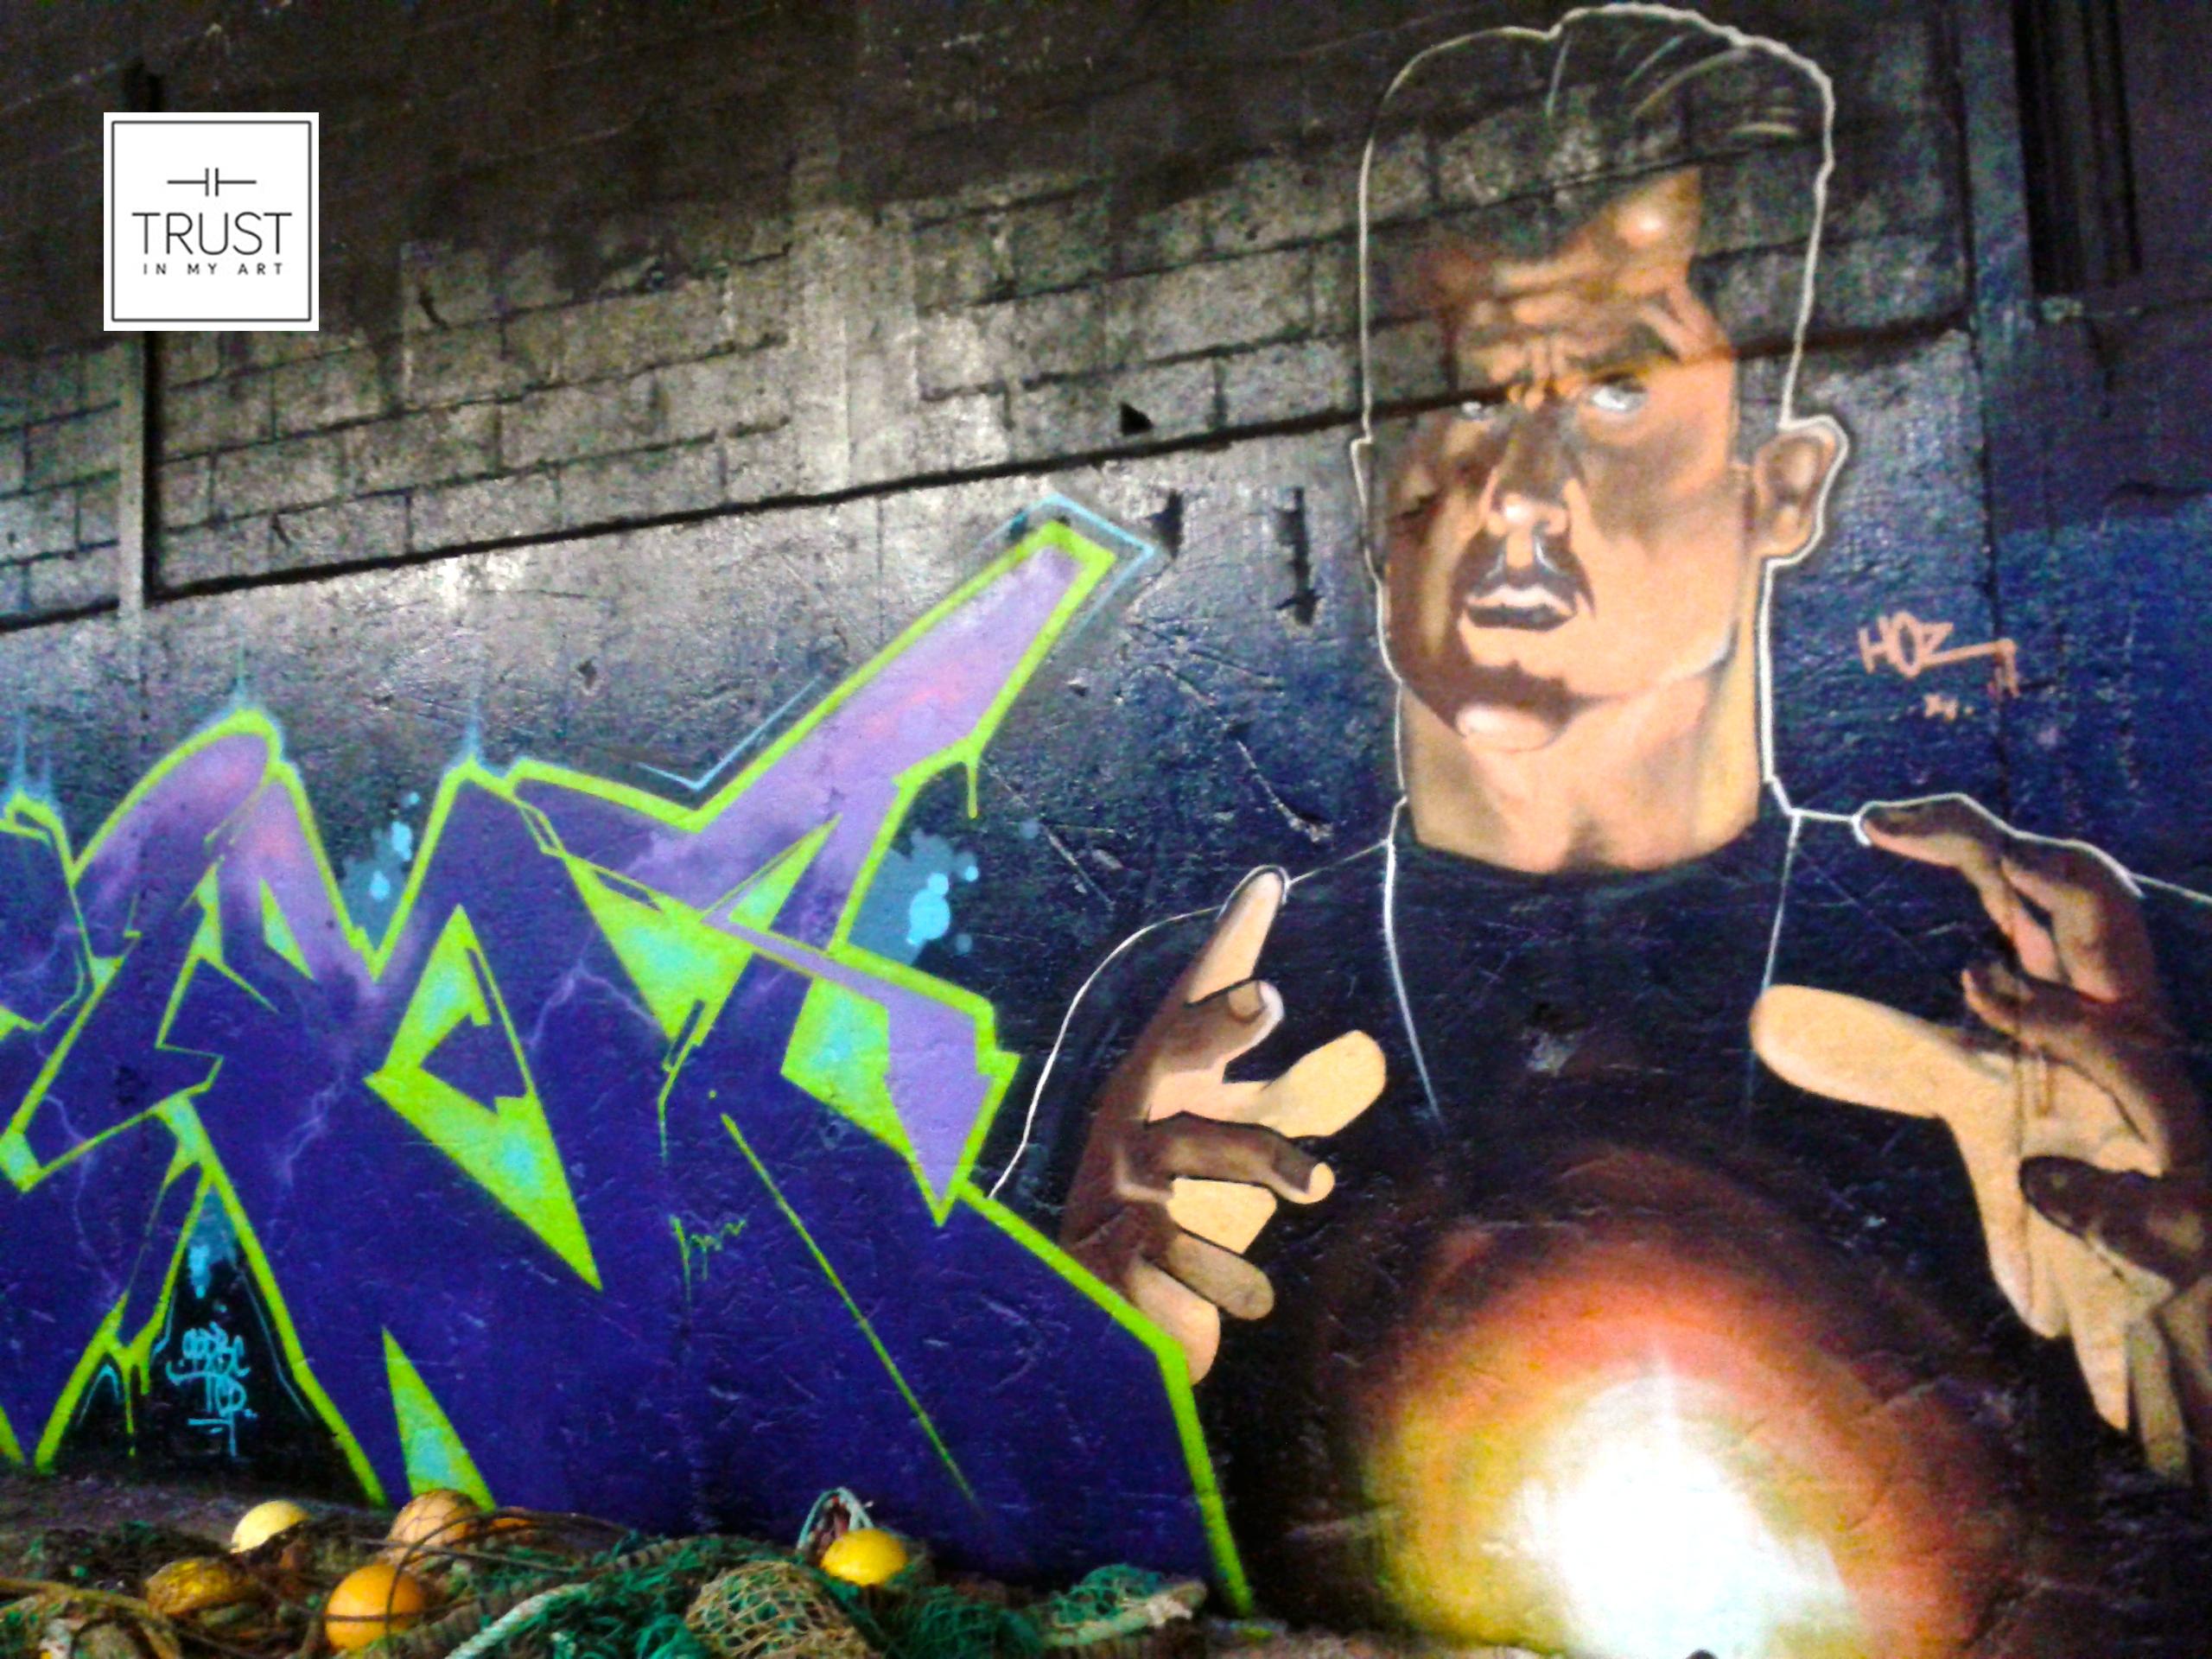 Session graffiti à Saint-Brieuc avec IOYE et AVERI